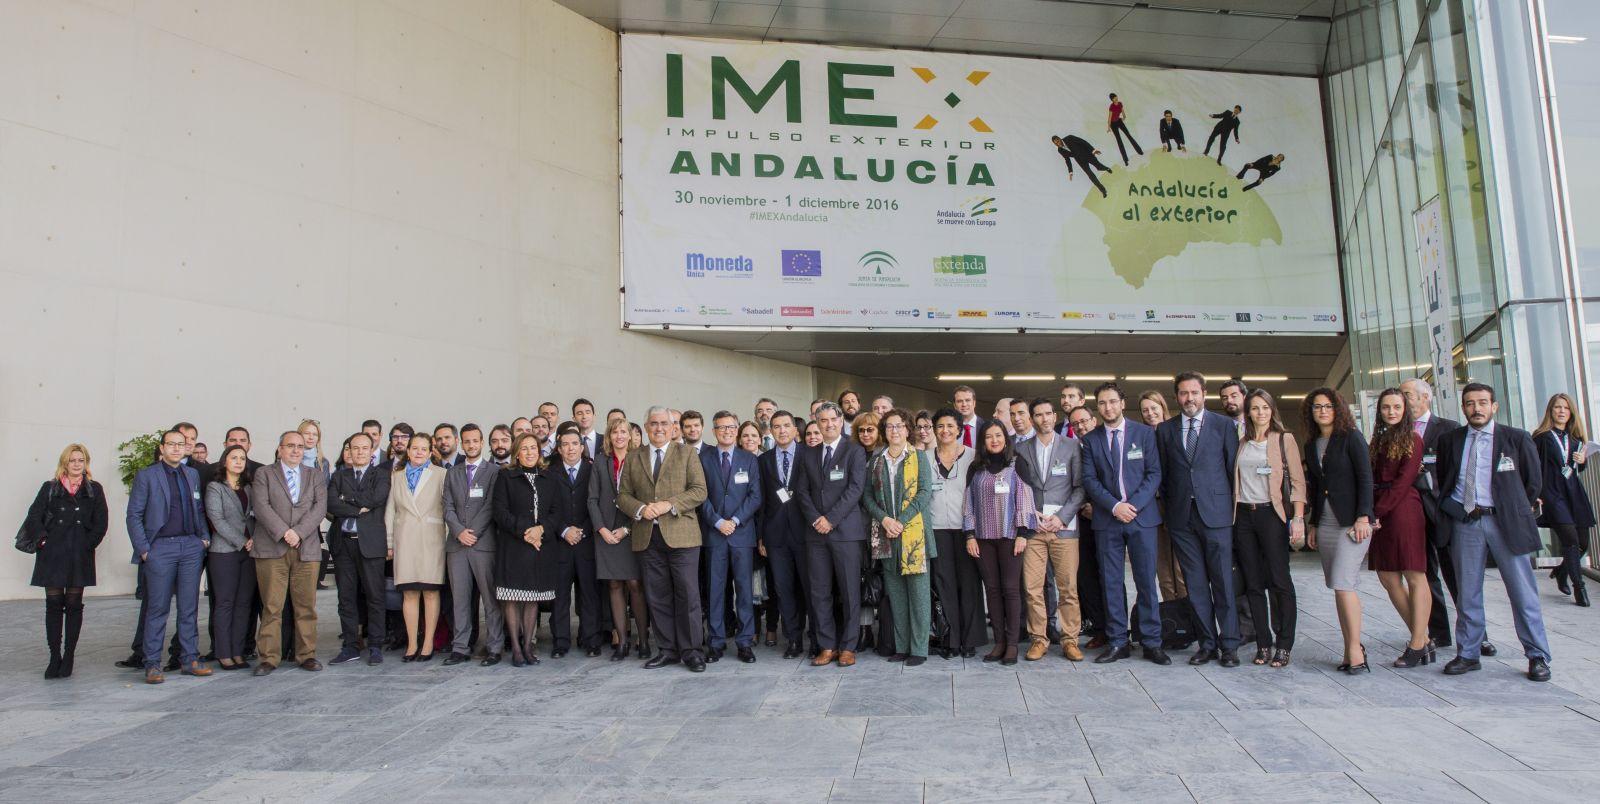 IMEX Andalucía 2016